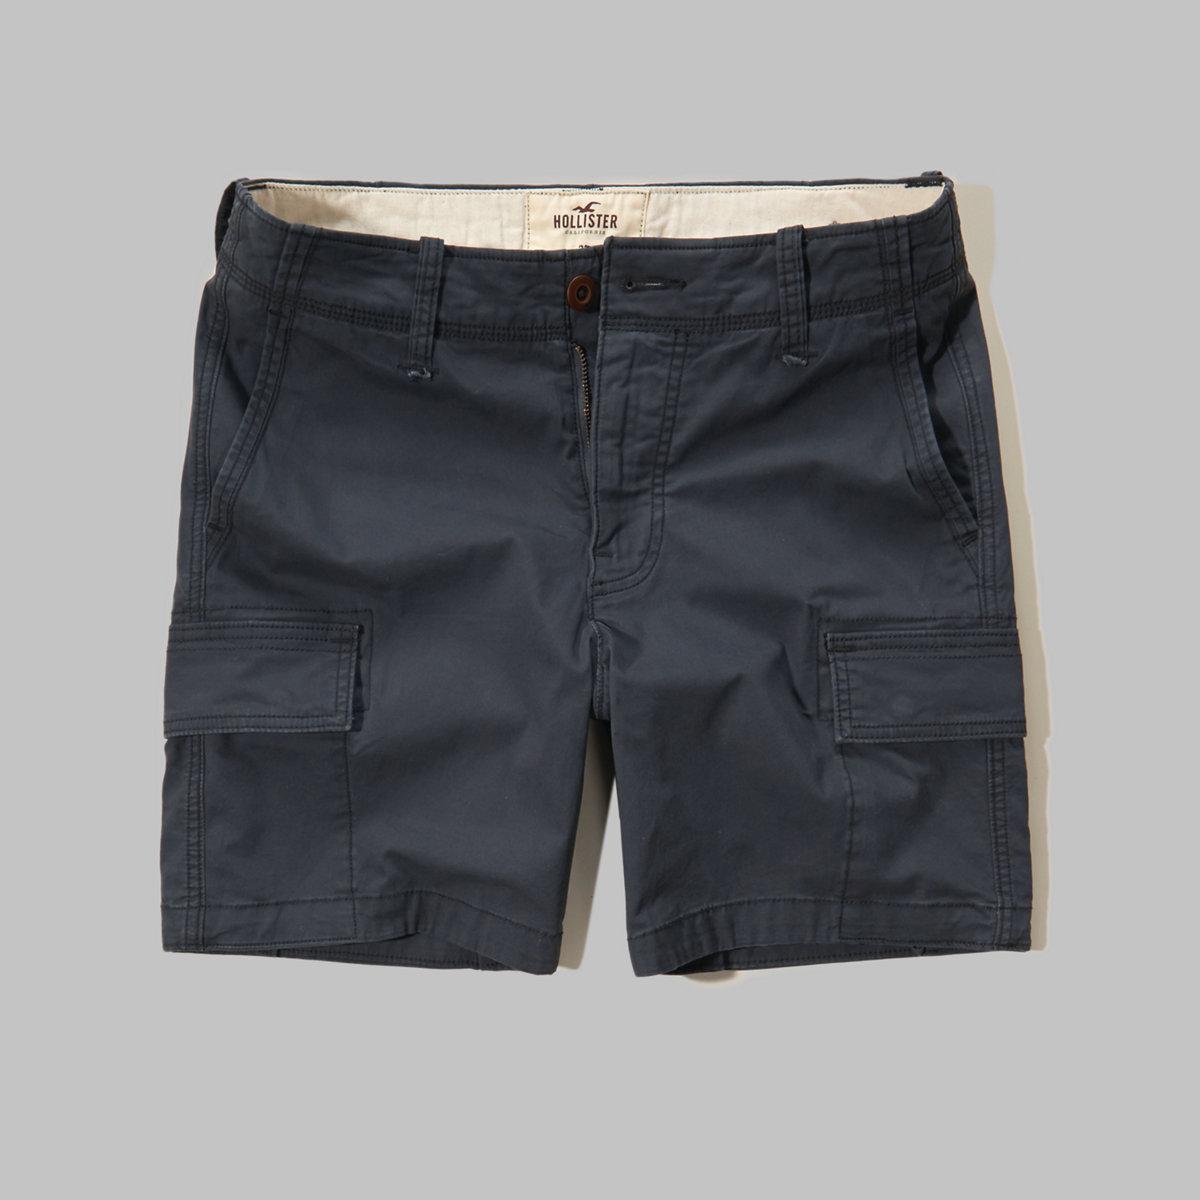 Hollister Beach Prep Fit Cargo Shorts